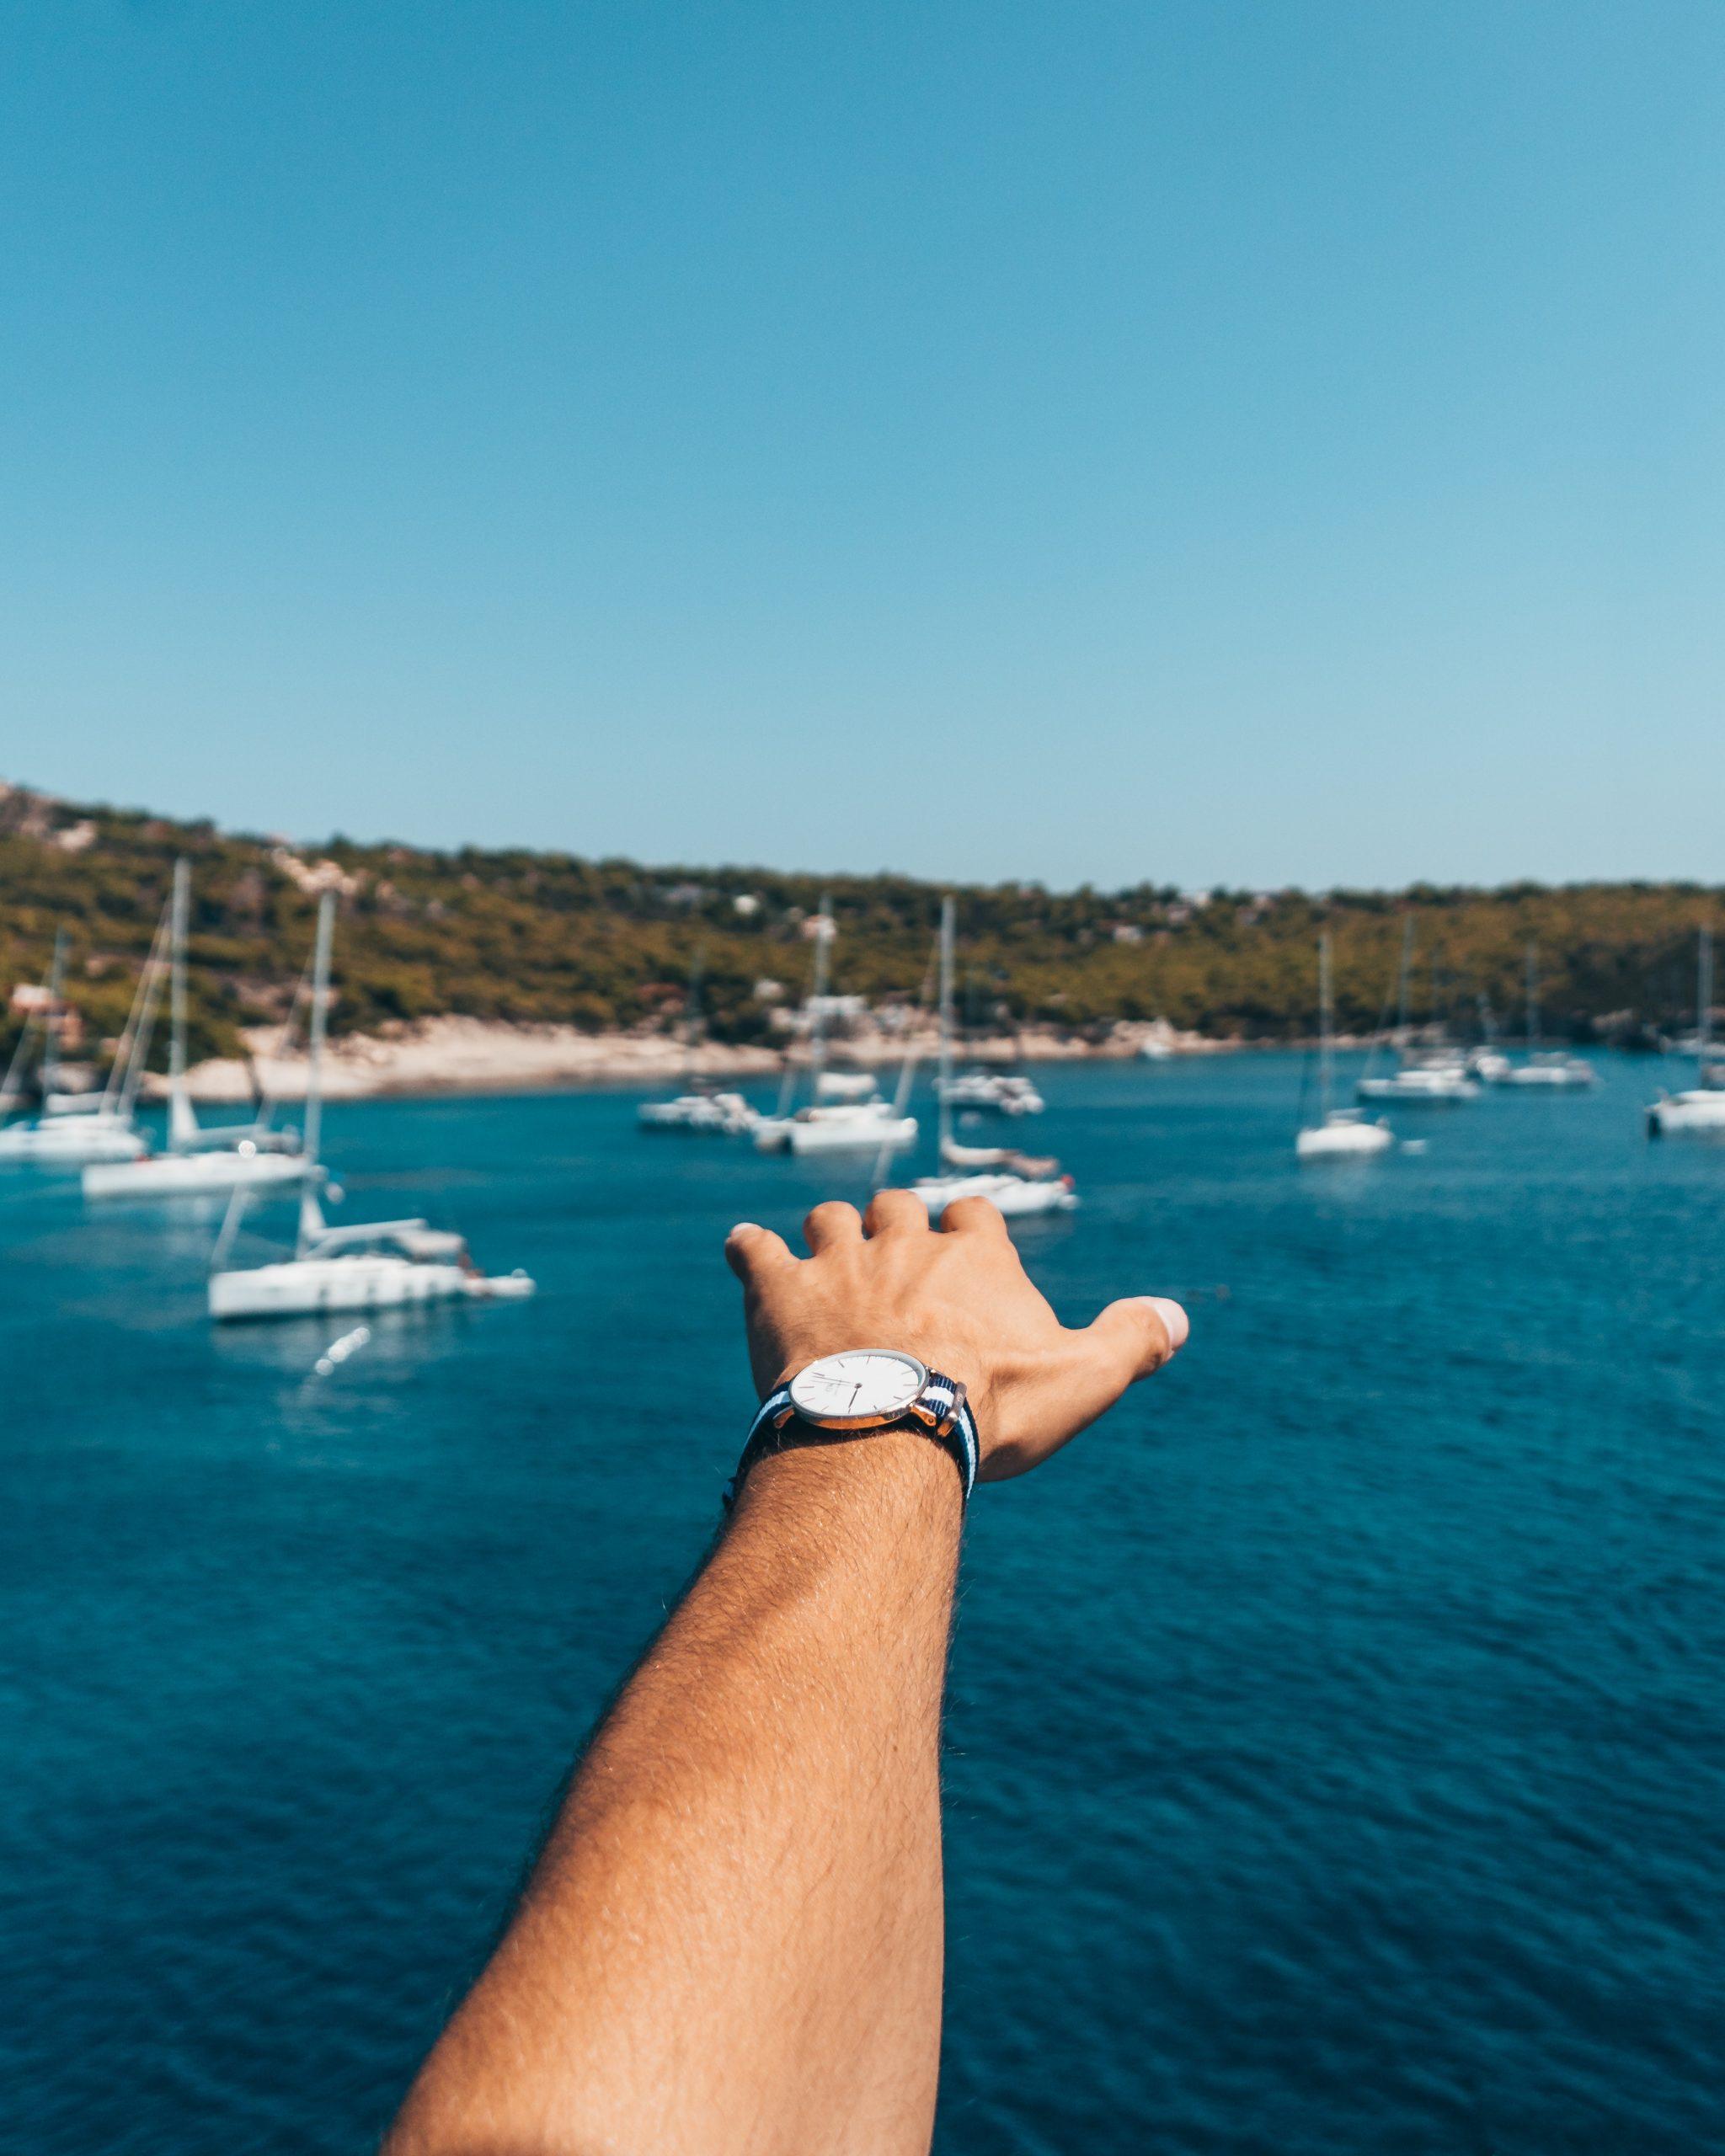 denia playa experience barcos genial